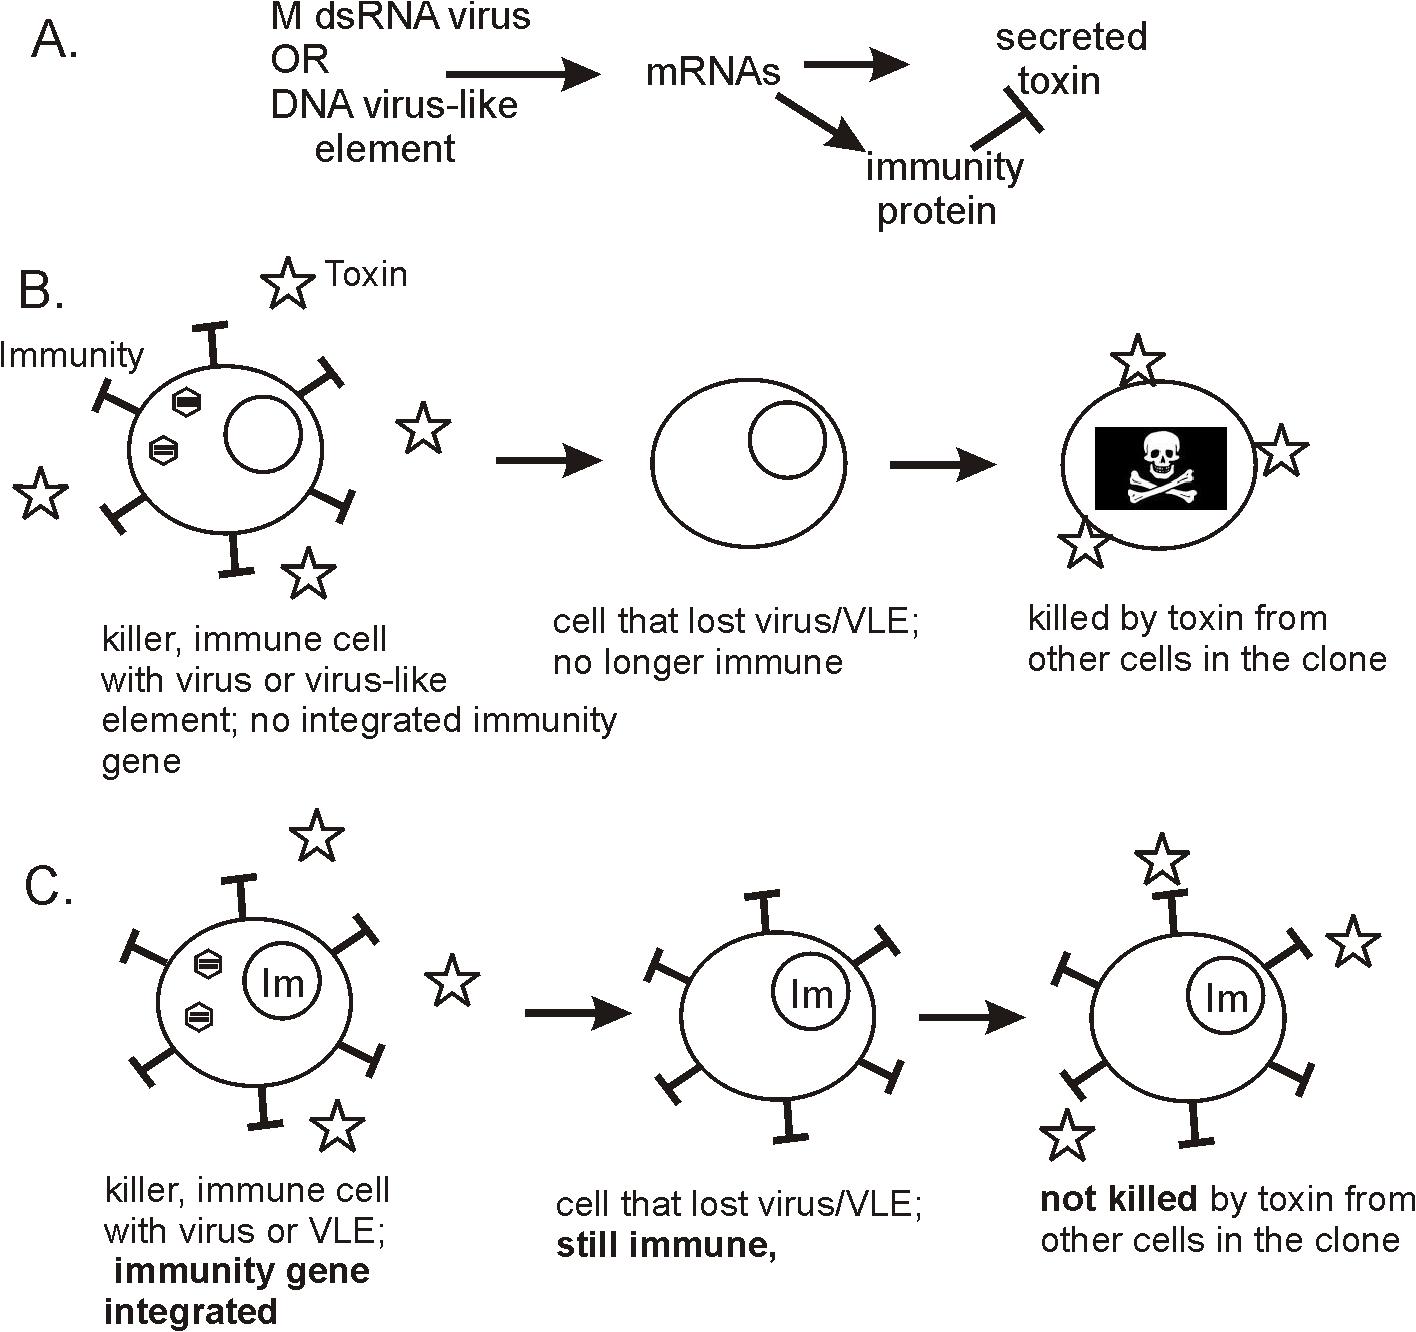 Biology of killer plasmids and viruses of yeasts.